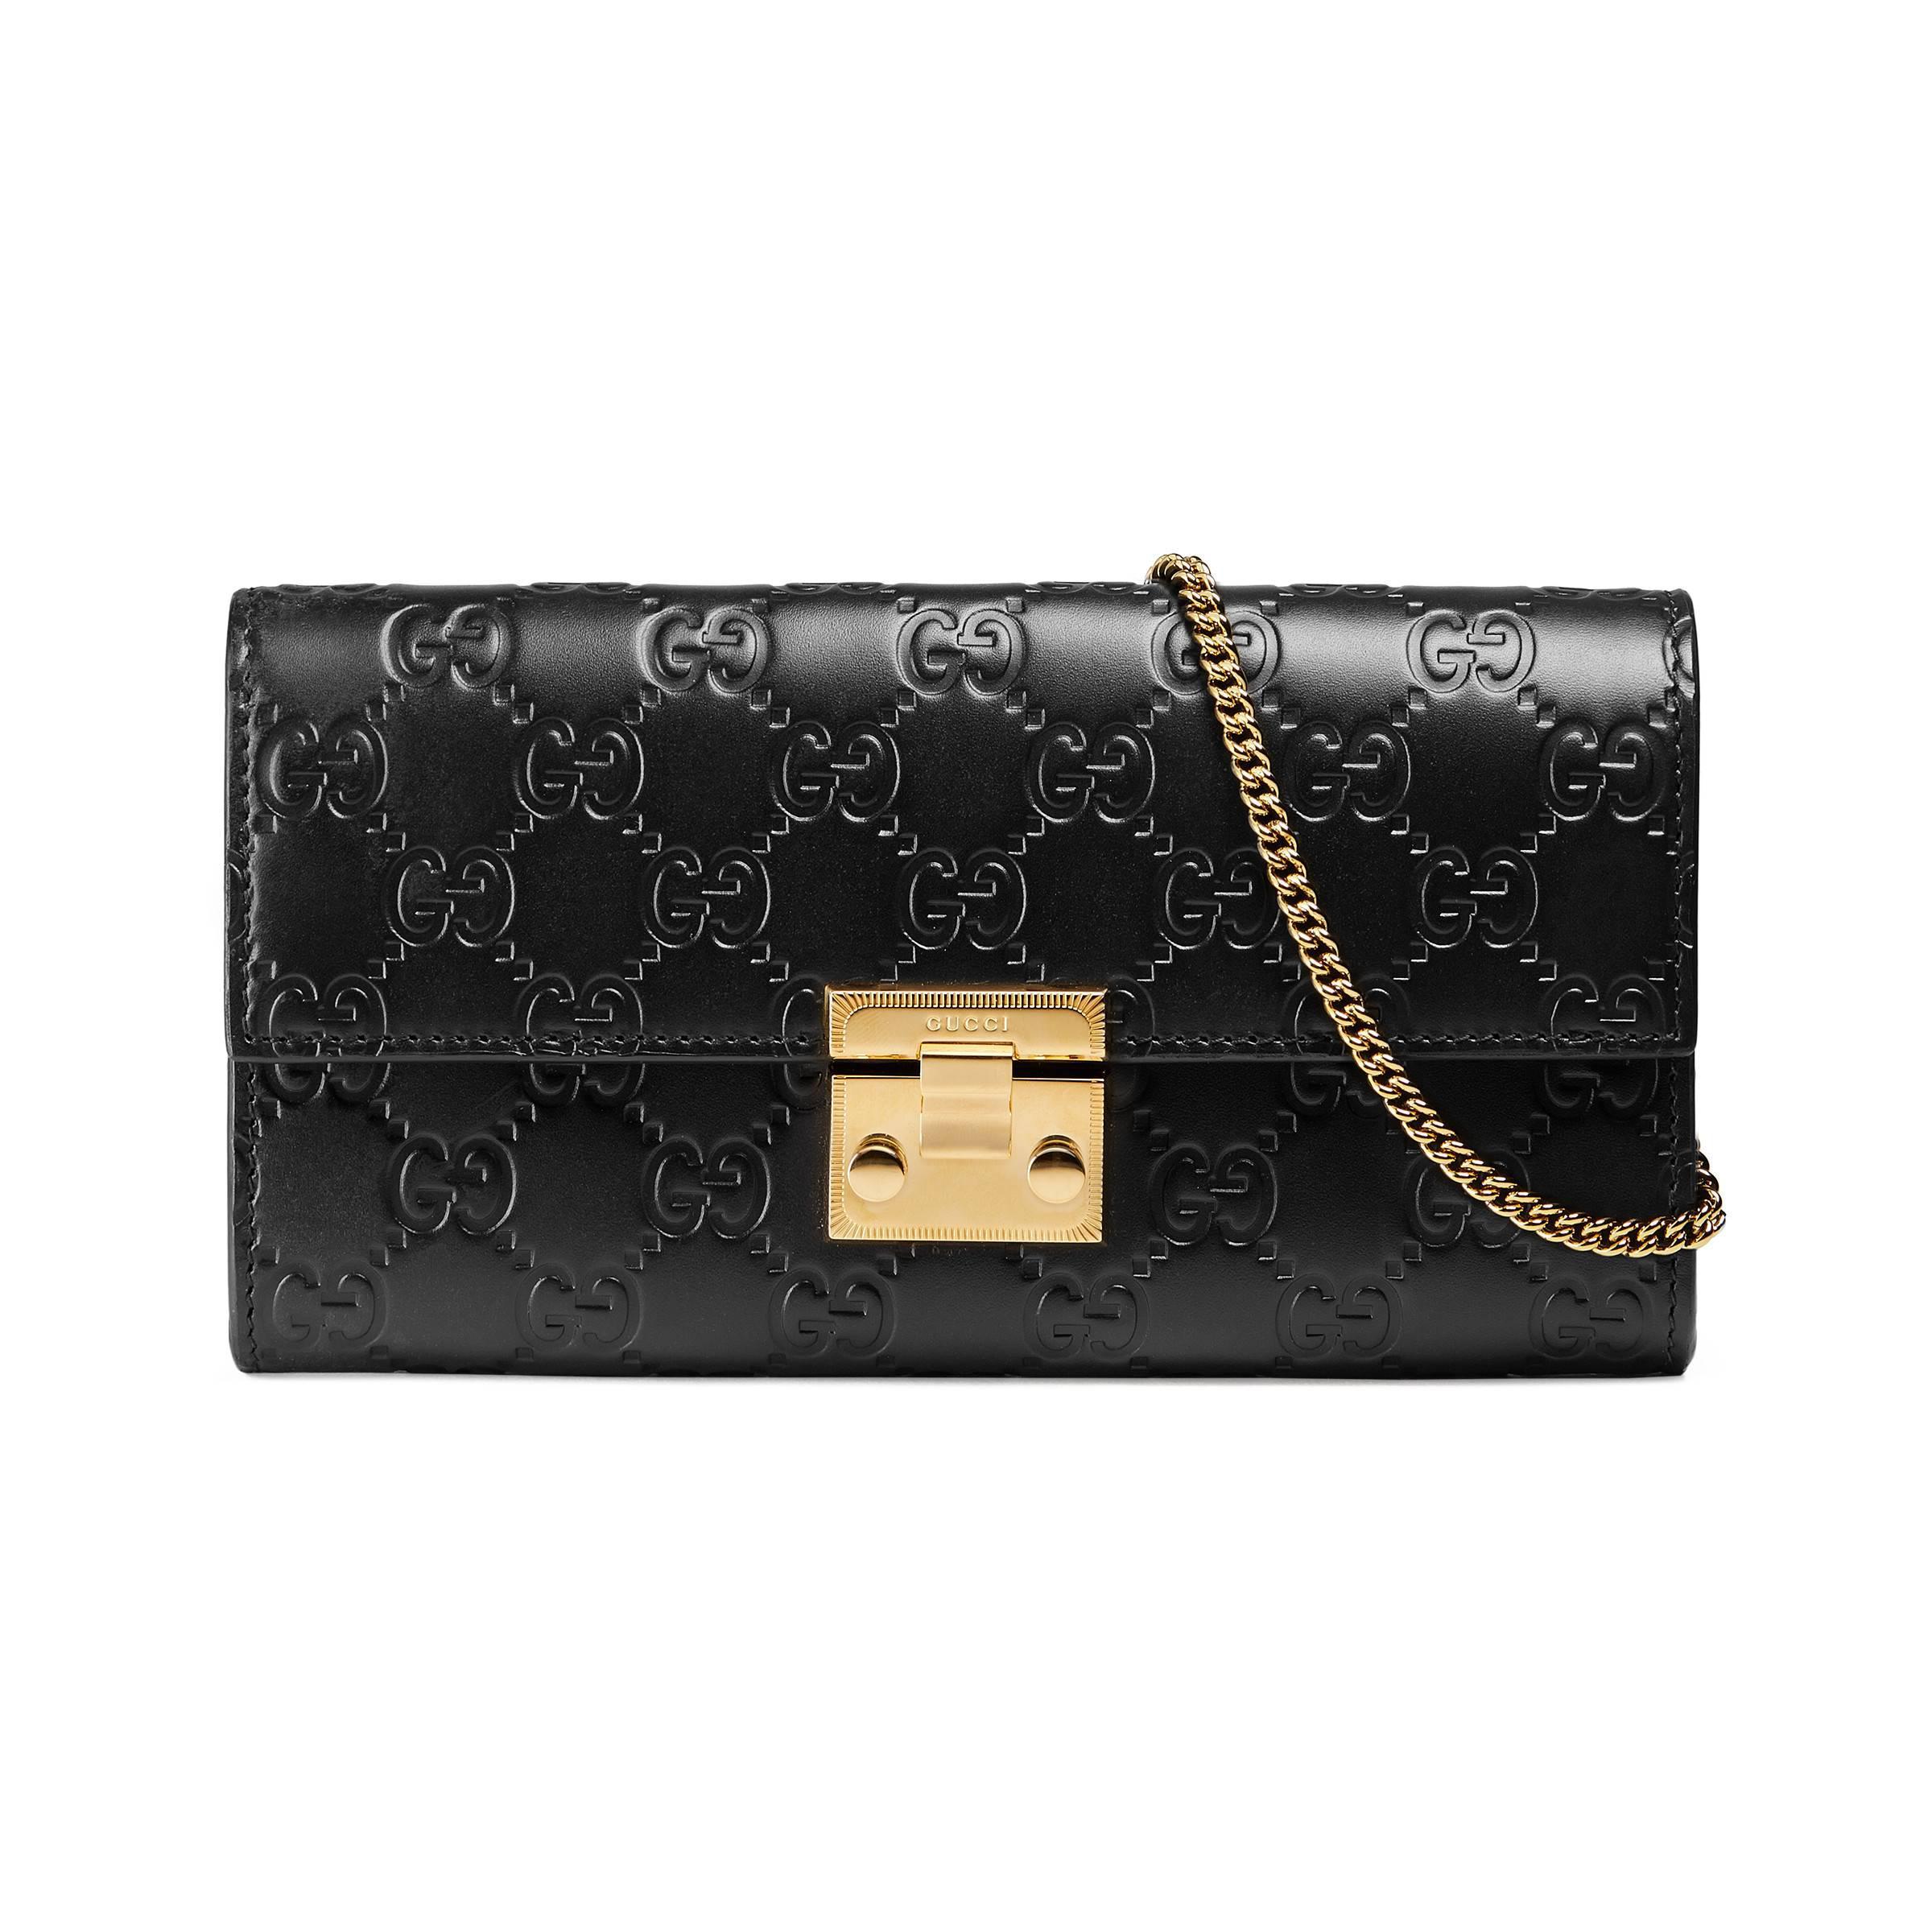 05225b49152 Gucci - Black Padlock Continental Wallet - Lyst. View fullscreen